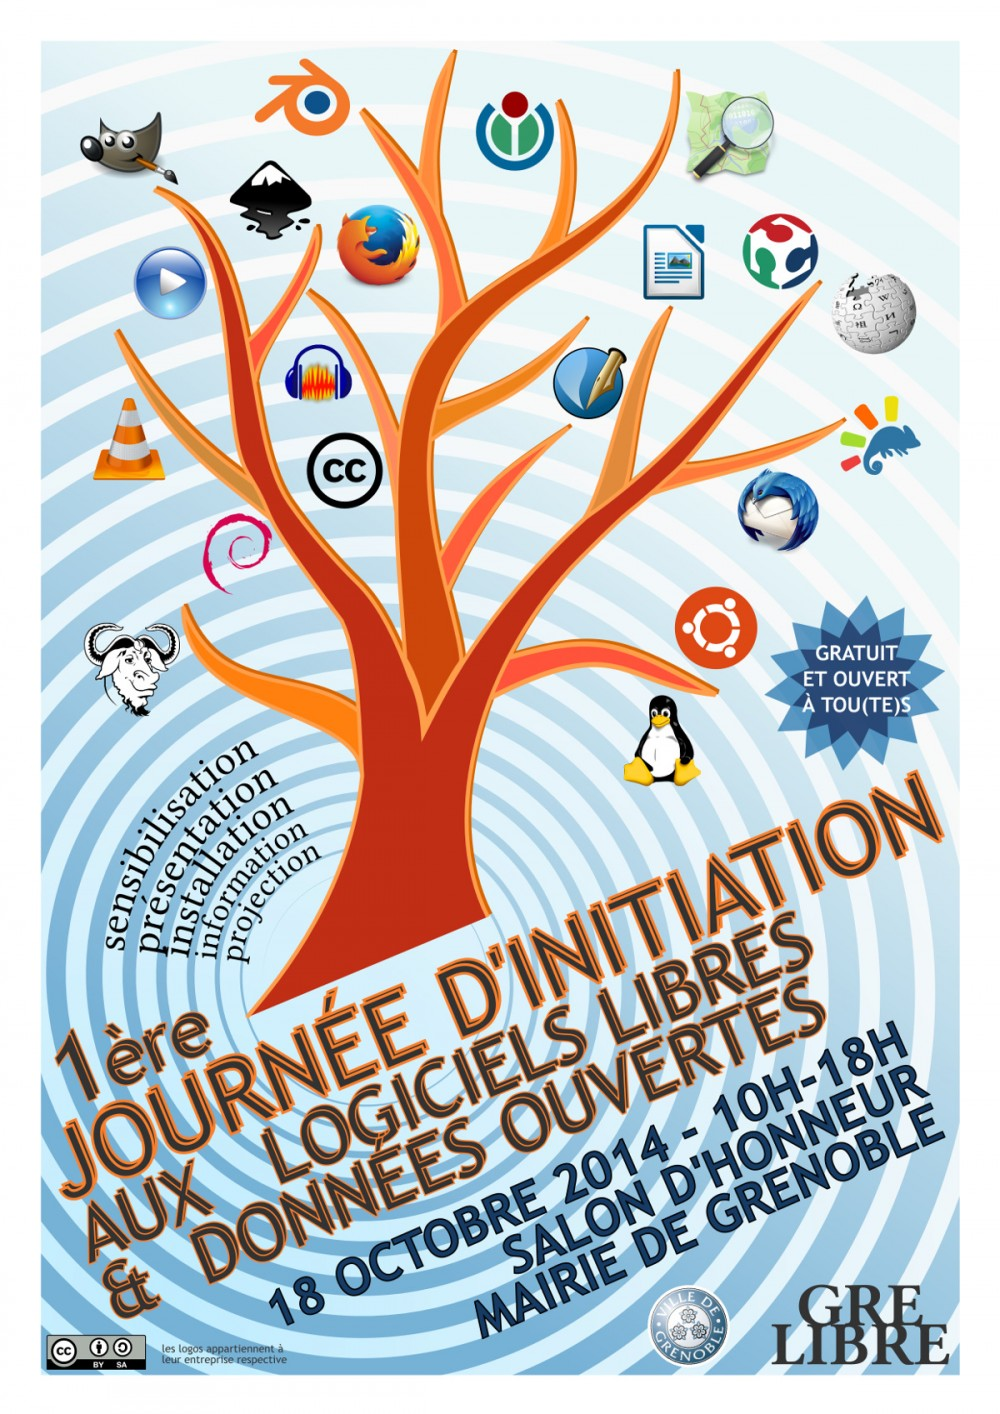 Affiche-RencontresLibre-oct2014